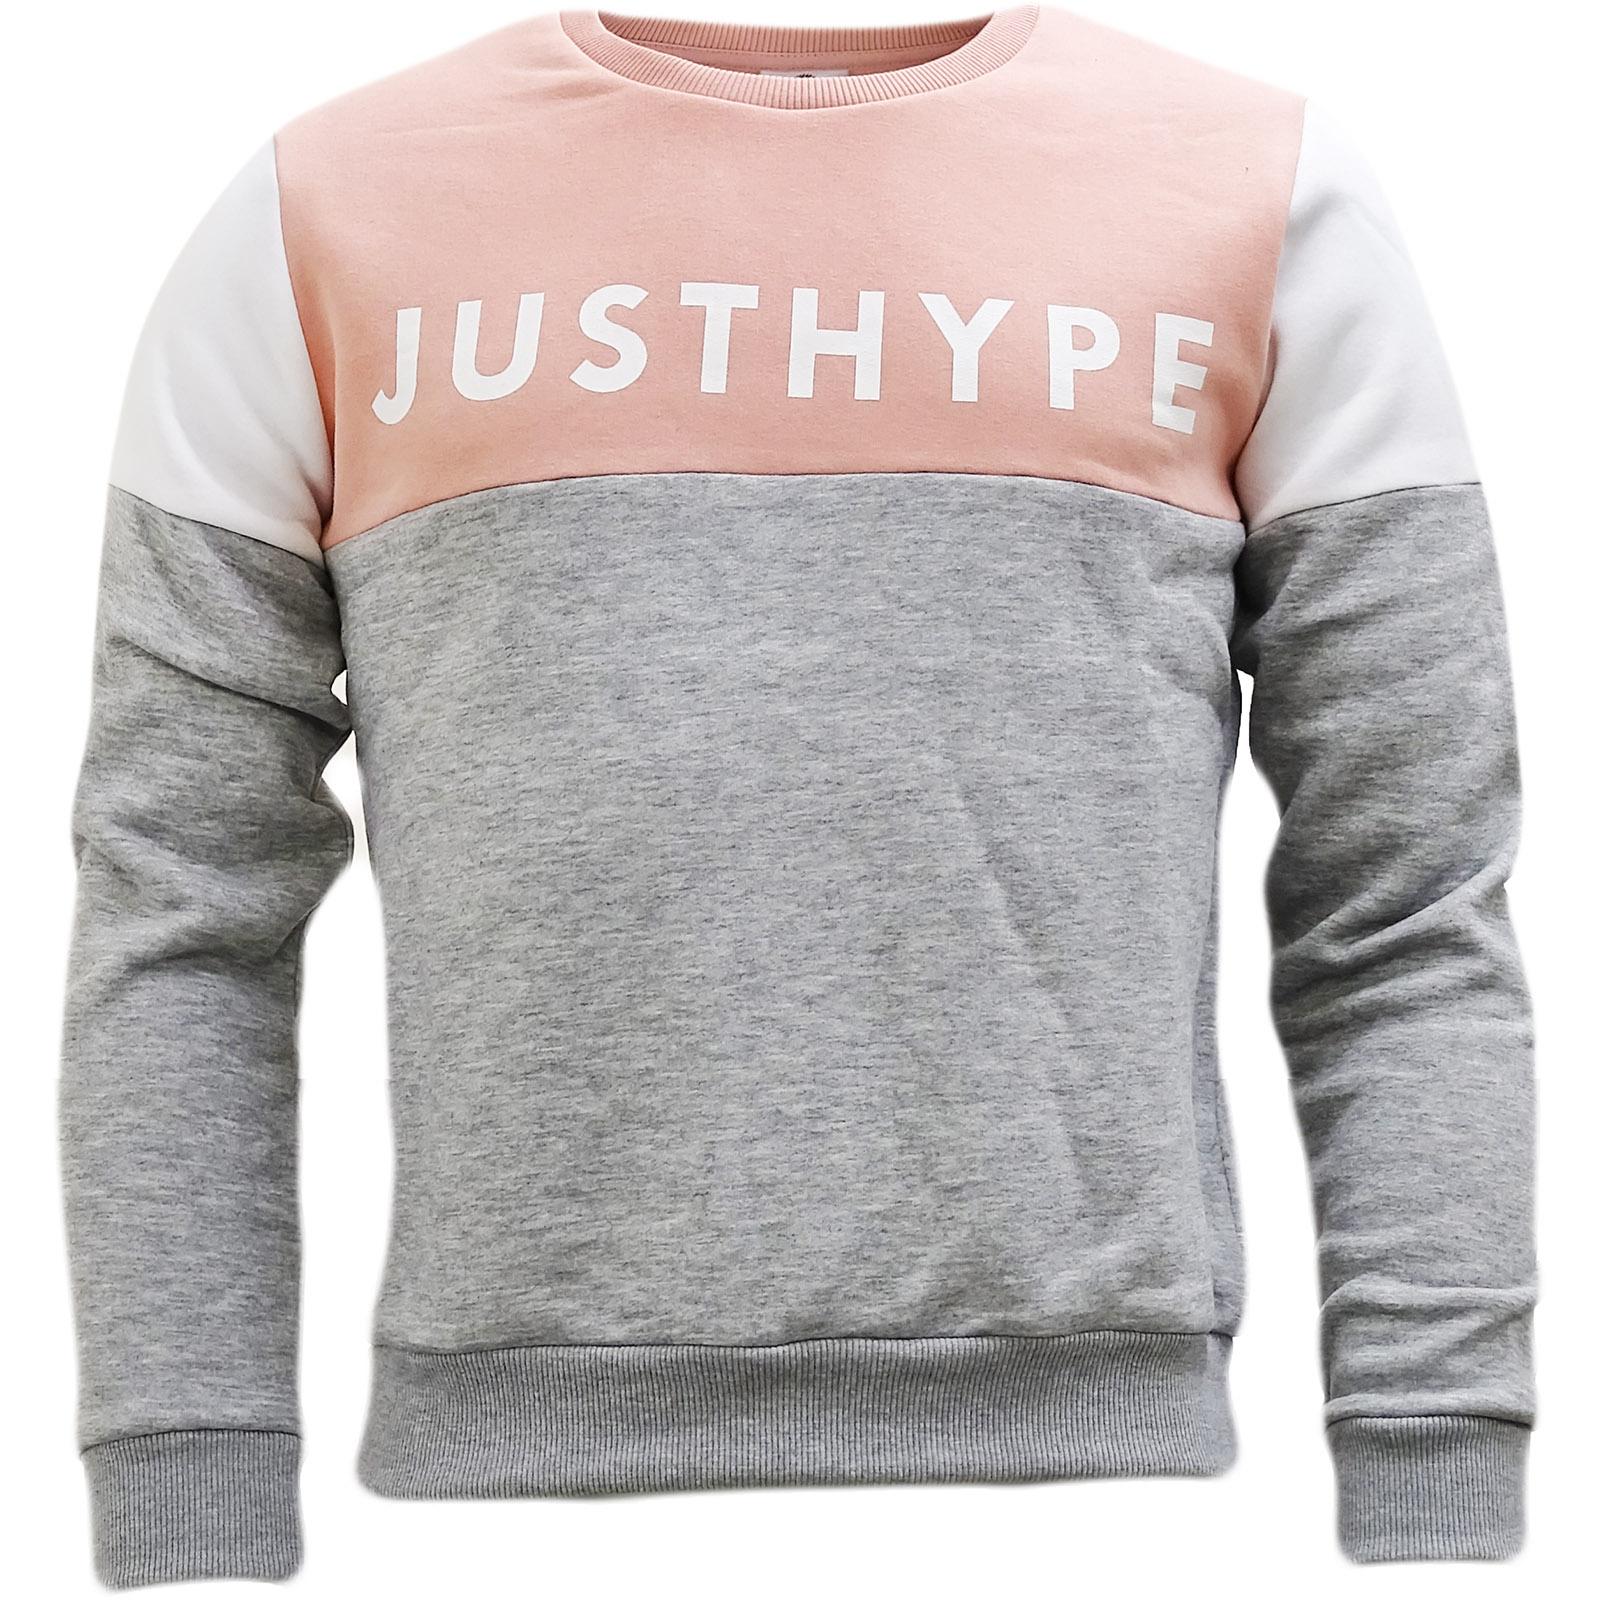 Hype Pink / Grey Womens / Girls Block Panel Sweatshirt Jumper Flip Panel 123 -